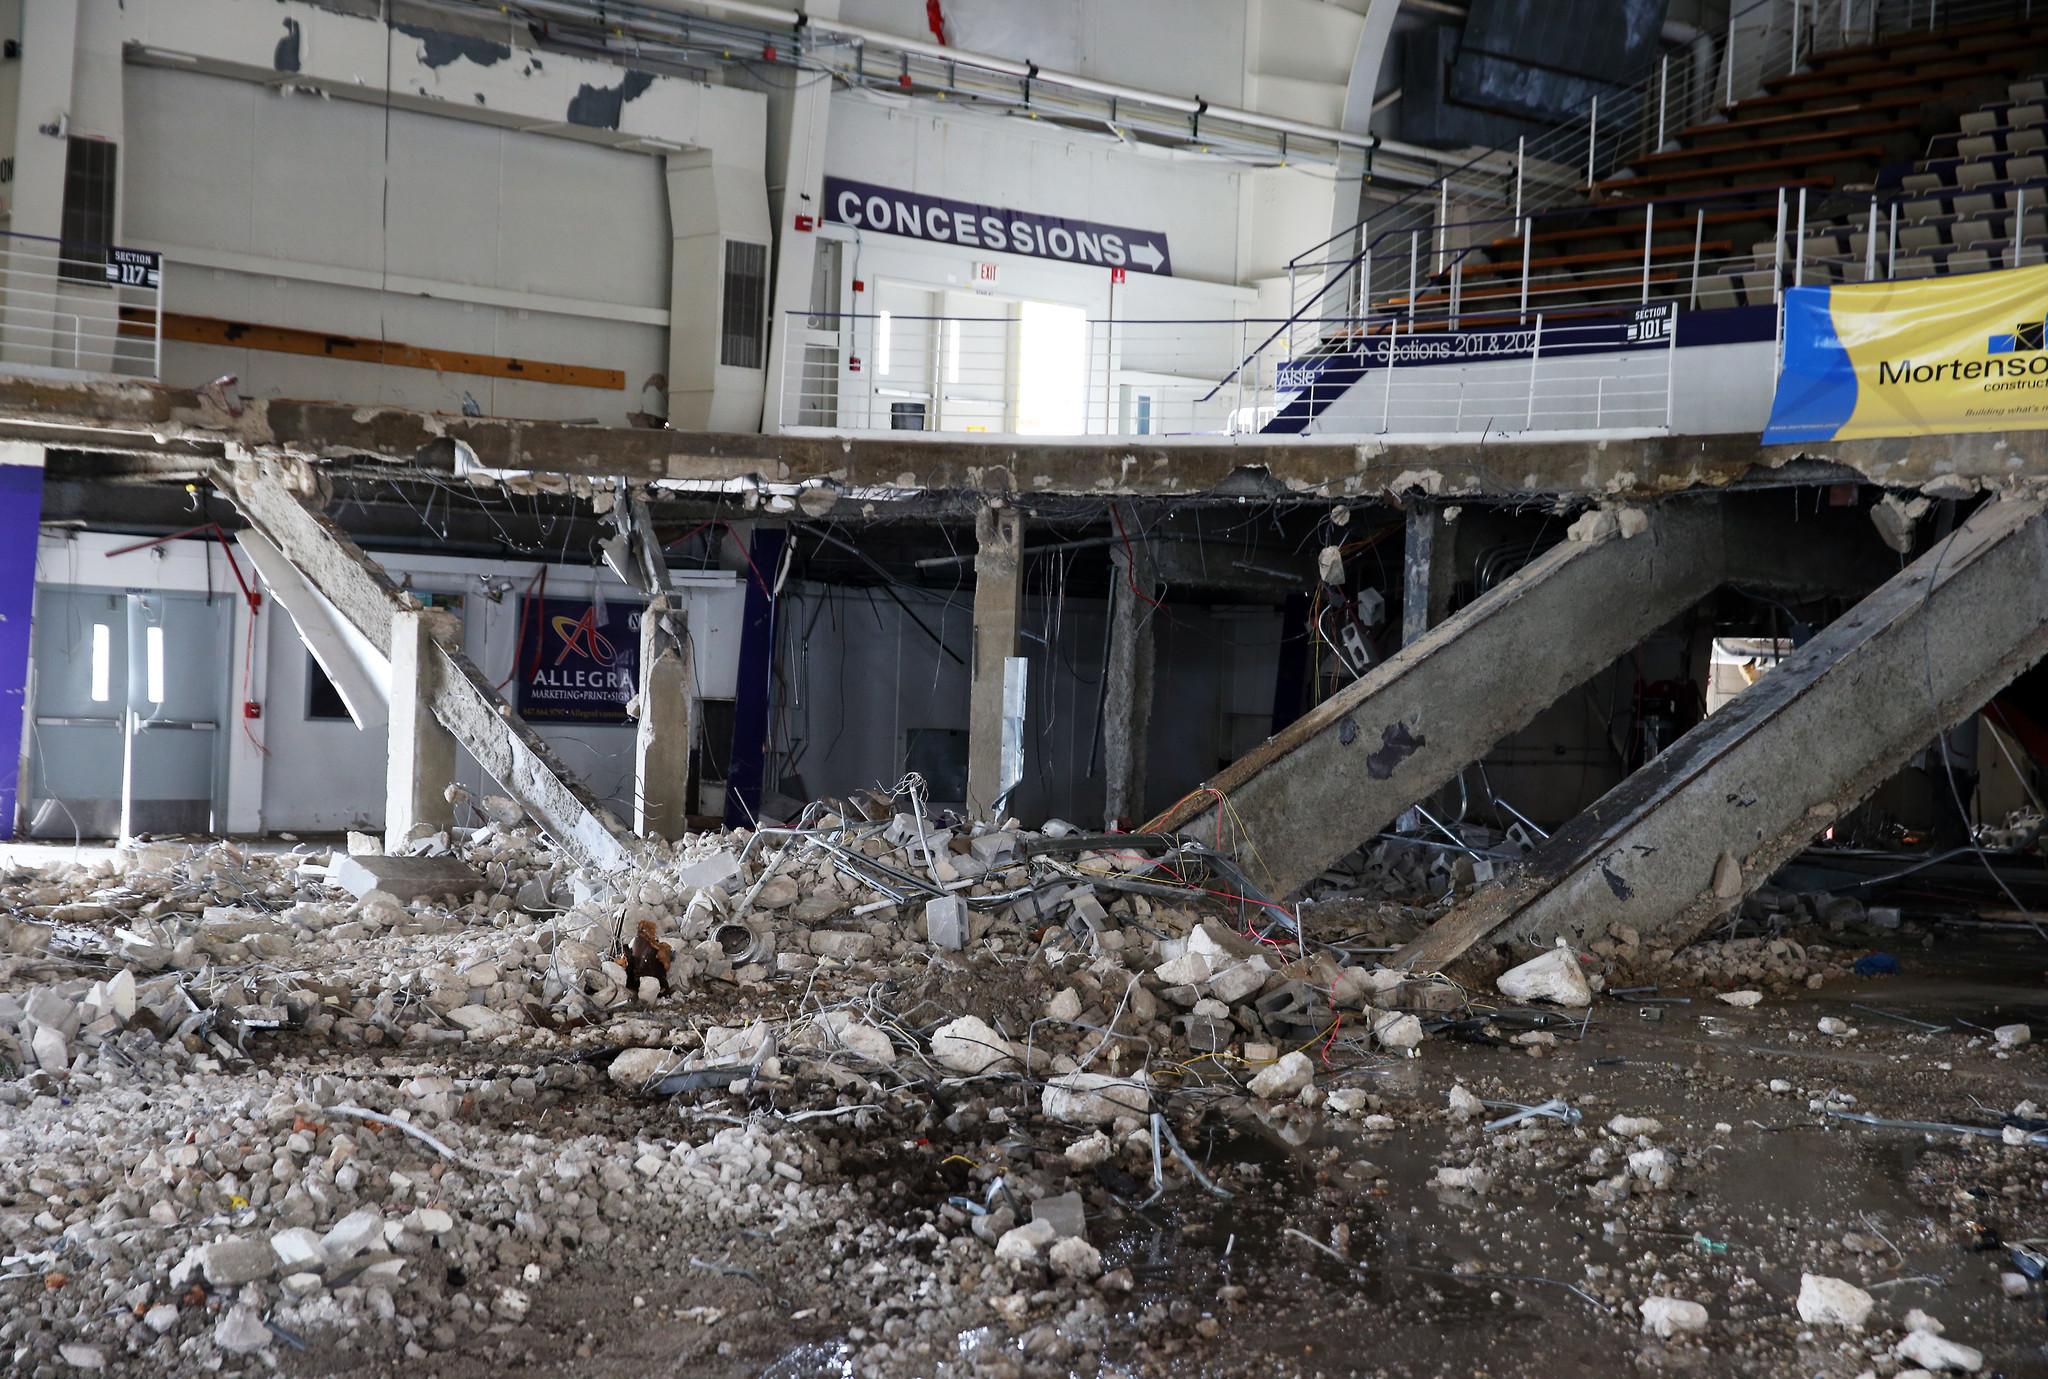 Ct-welsh-ryan-arena-renovation-northwestern-spt-0503-20170502